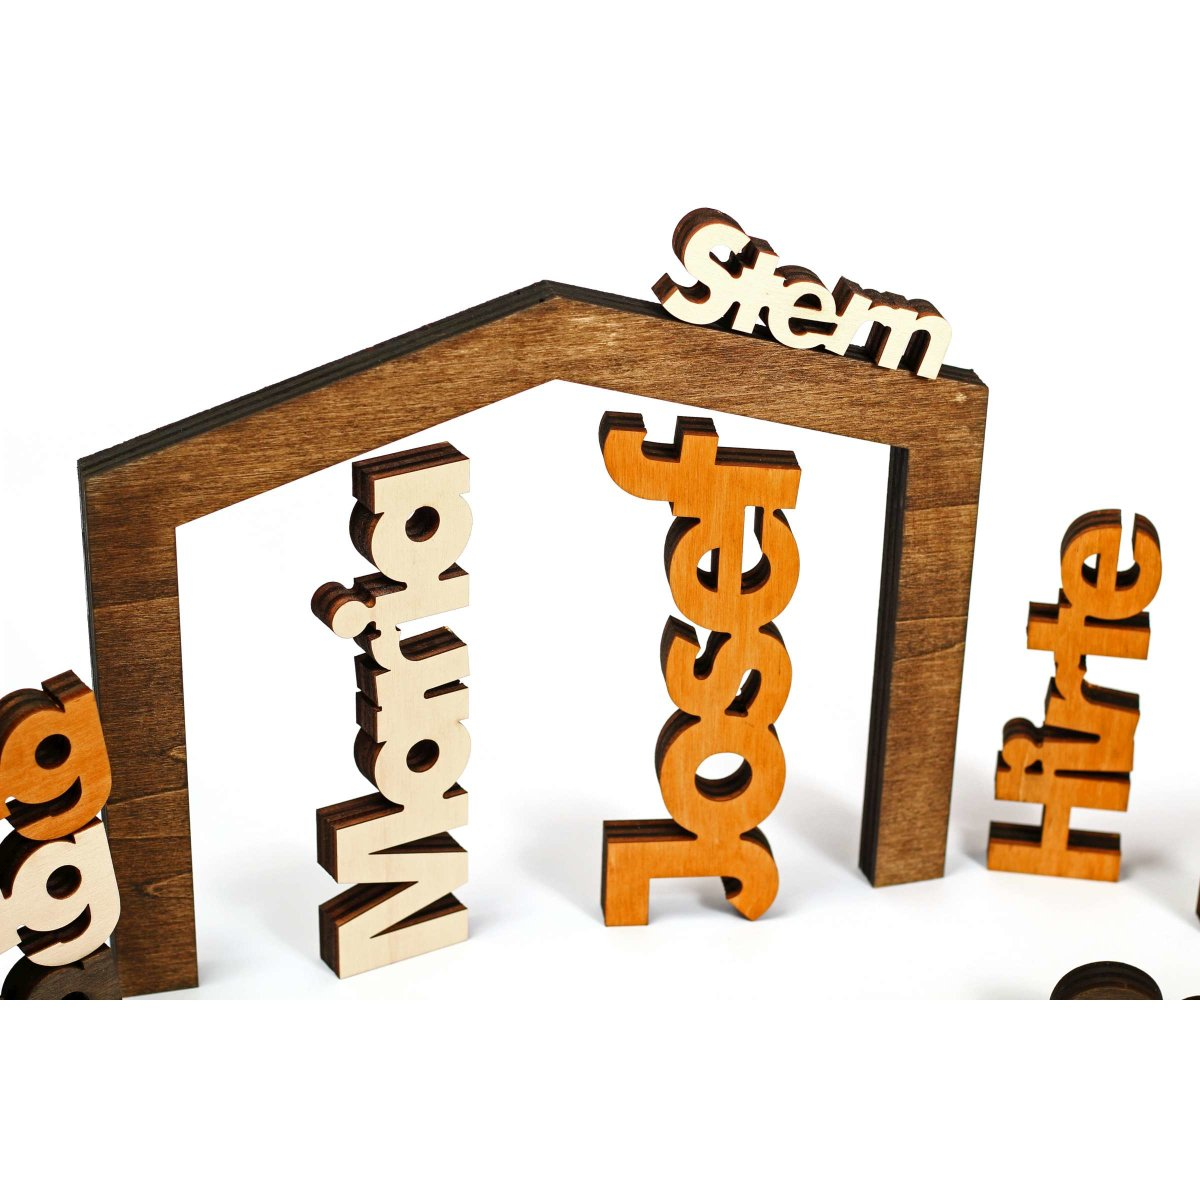 Weihnachtskrippe Modern.Moderne Weihnachtskrippe 11 Teilig Holz Farbig Geölt Puristisch Rustikal Exklusiv Made In Tirol Xl